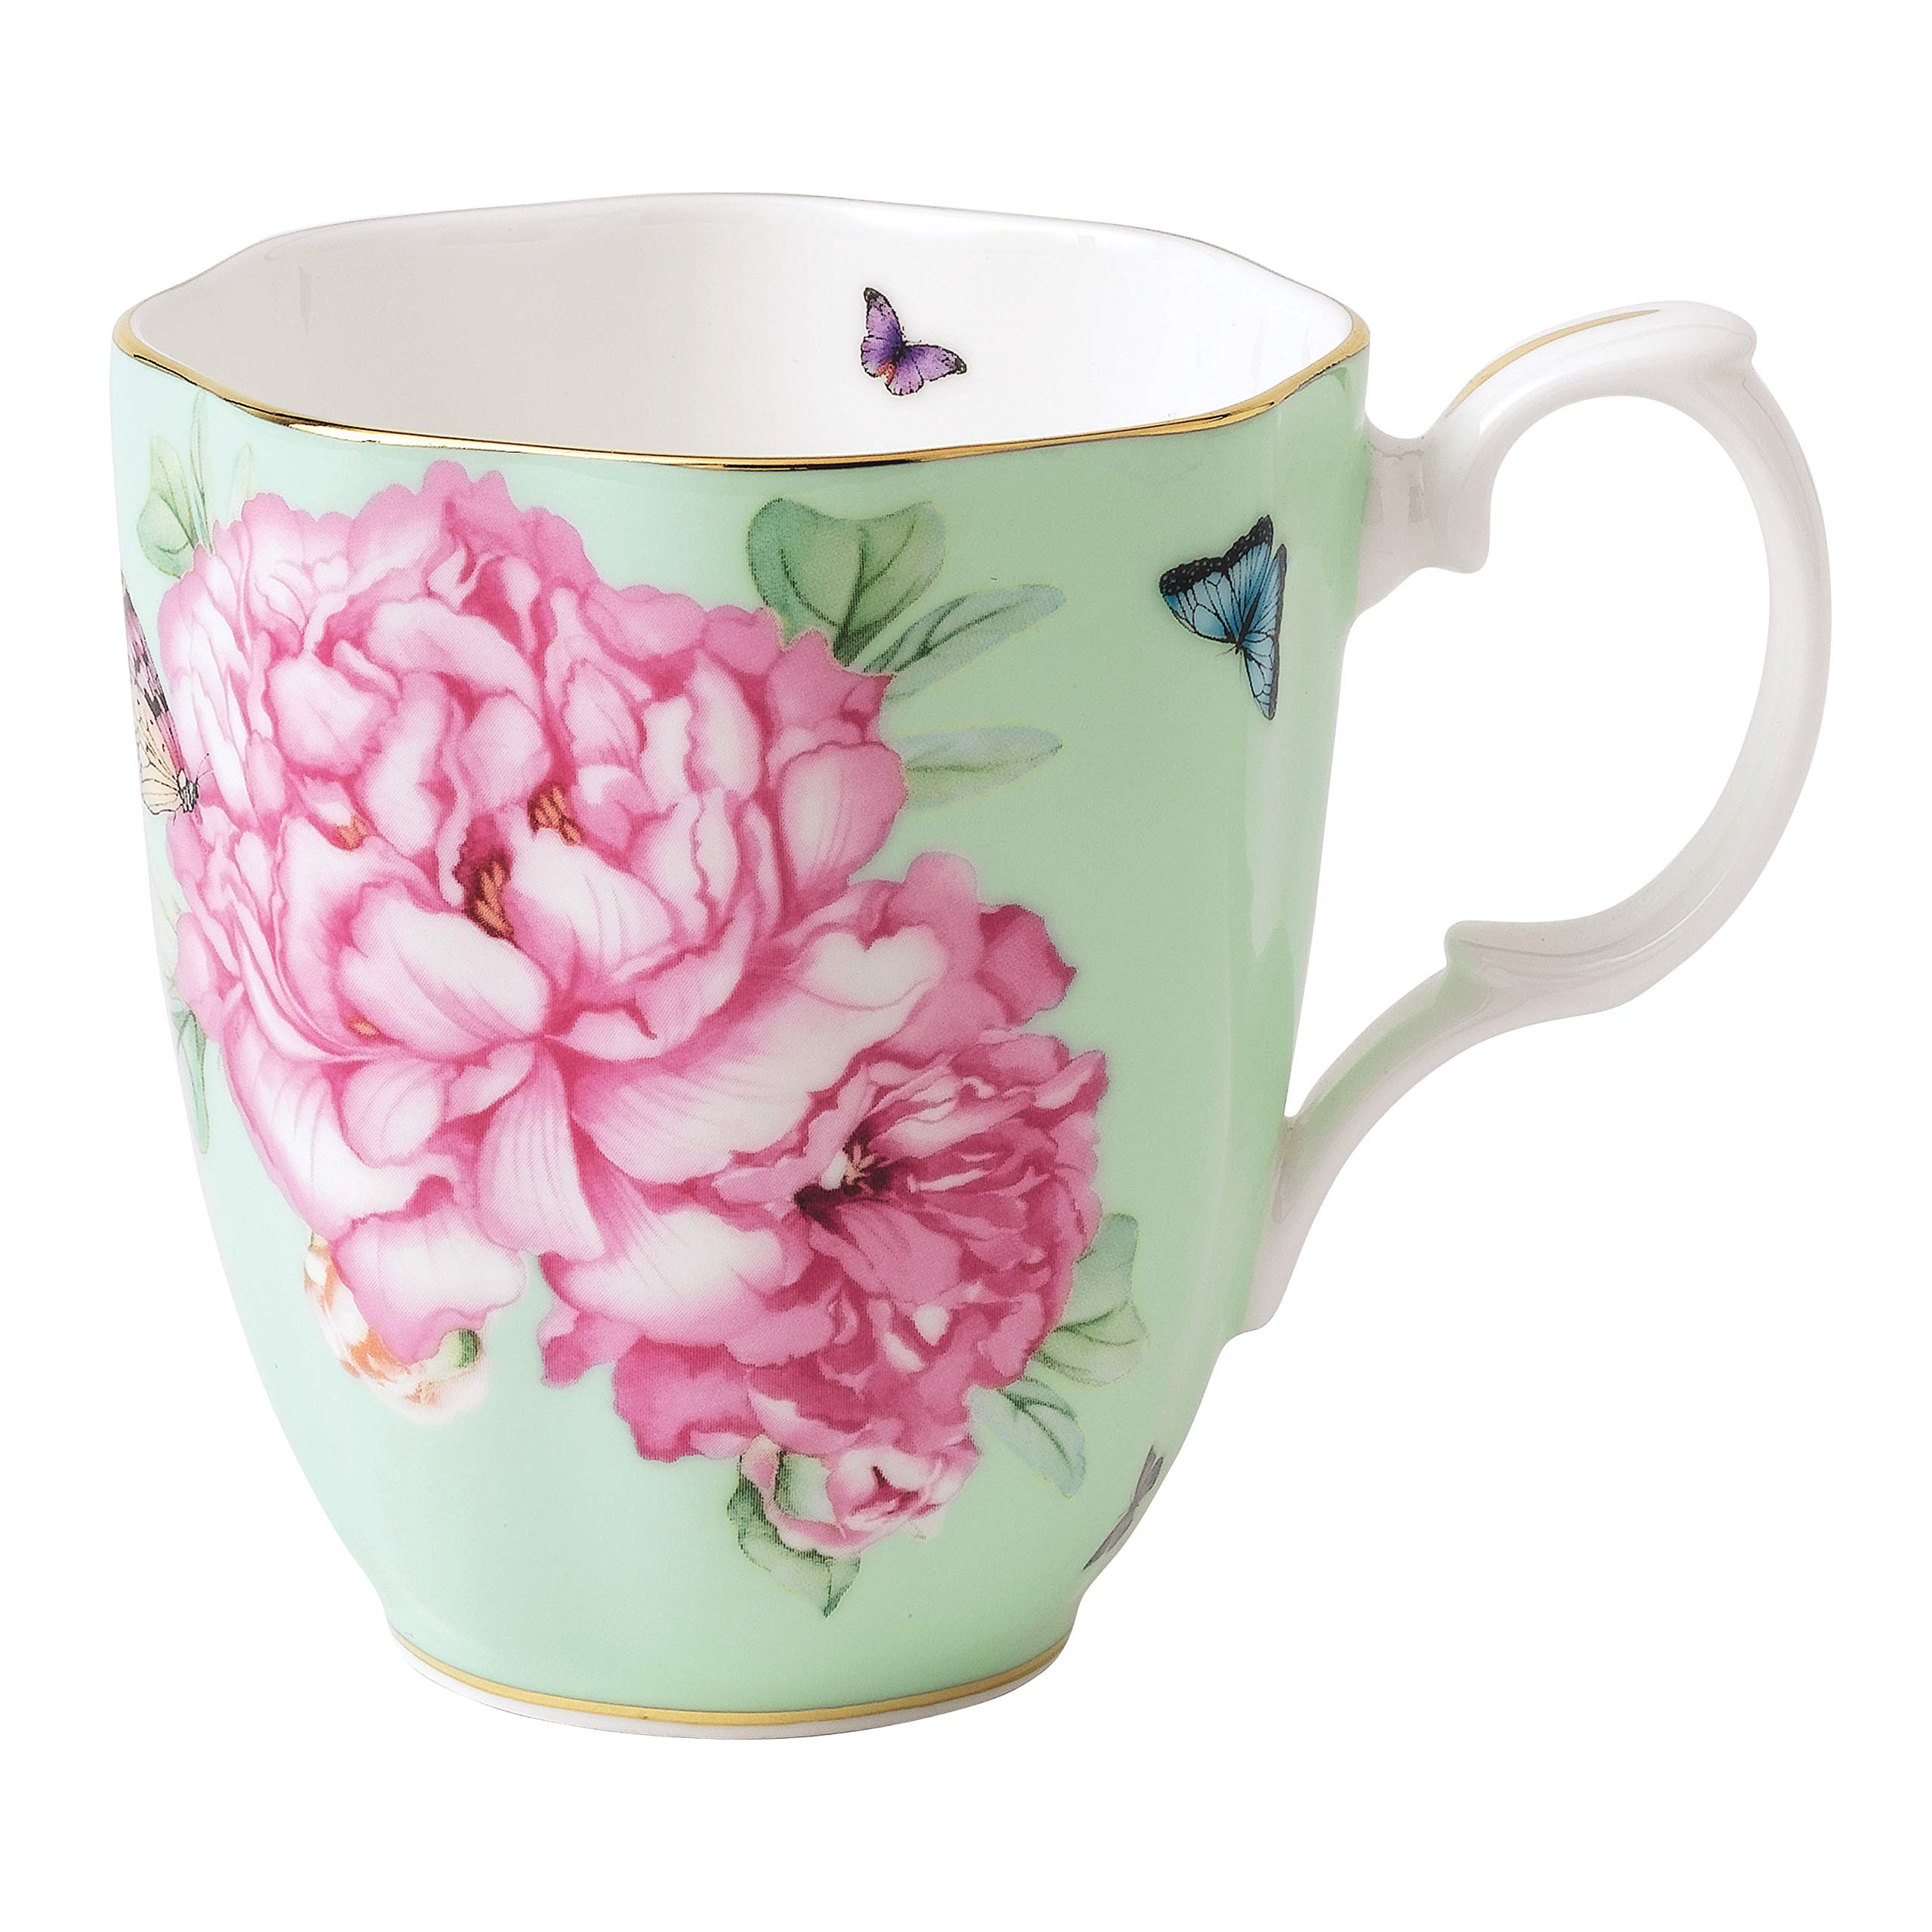 Royal Albert Friendship Vintage Mug Designed by Miranda Kerr, 13.5-Ounce, Green